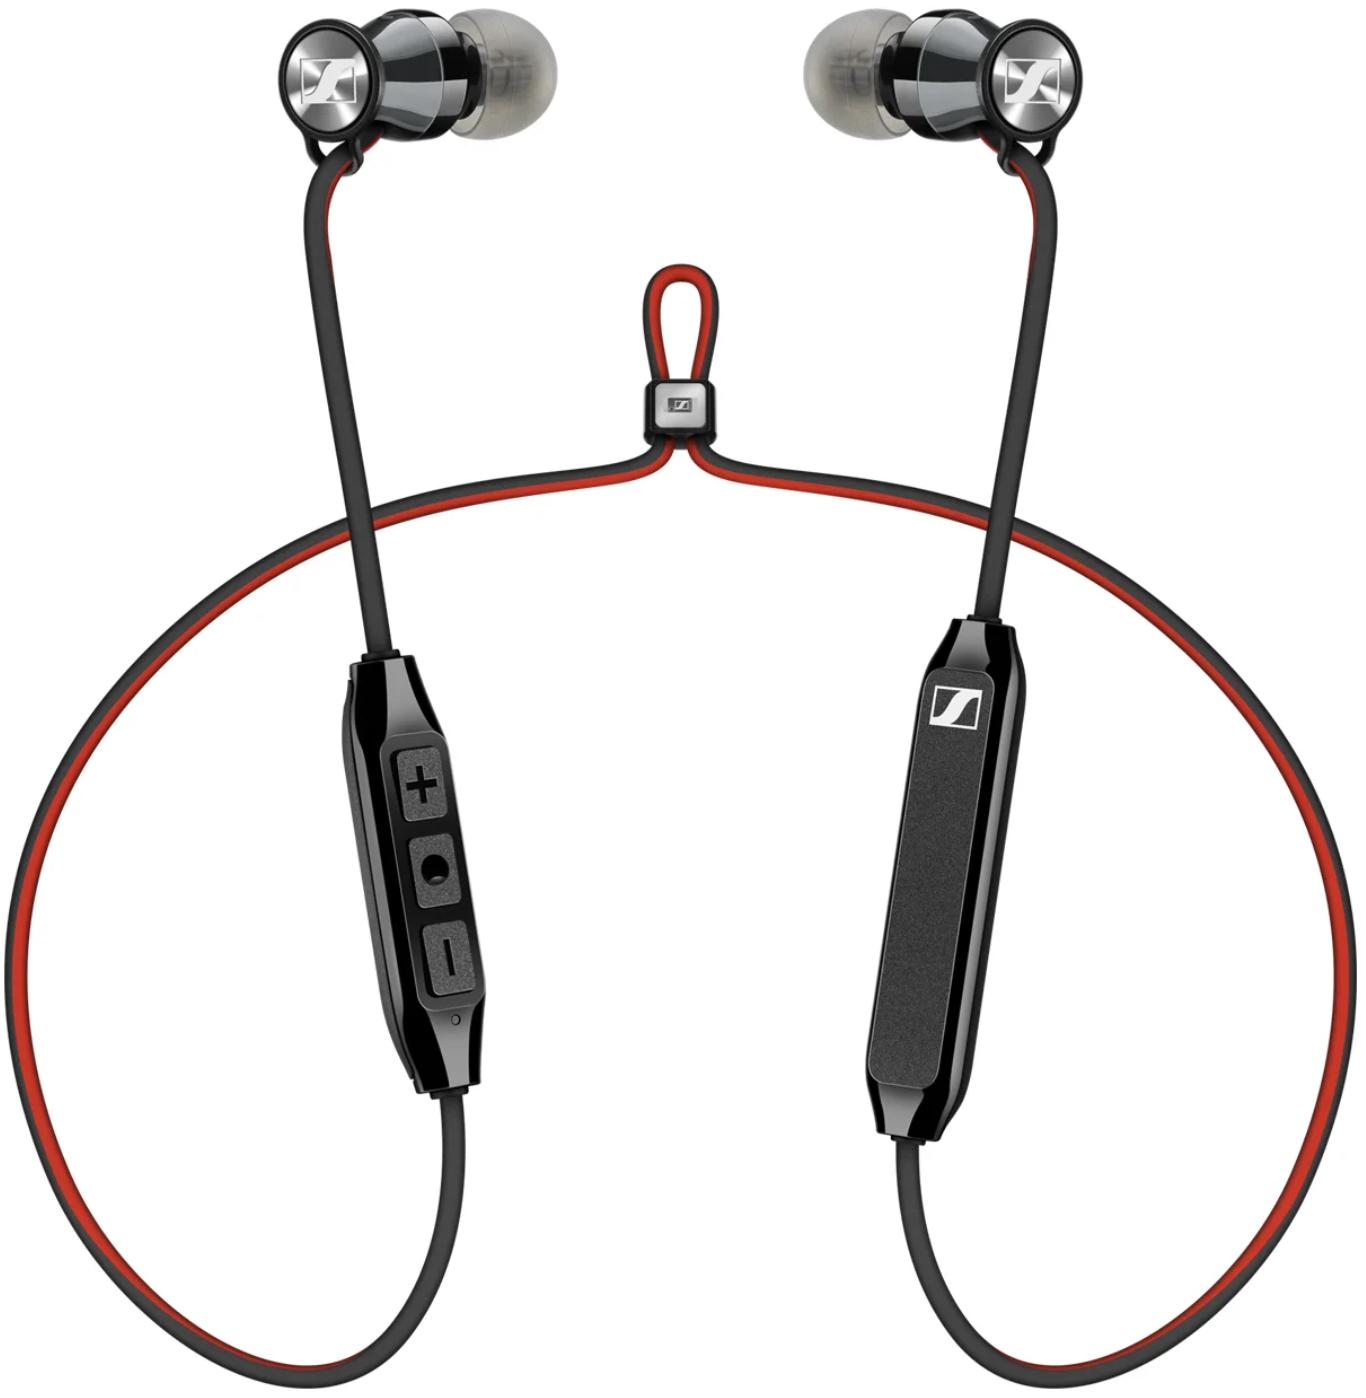 Sennheiser Momentum Free In-Ear Headphones Black